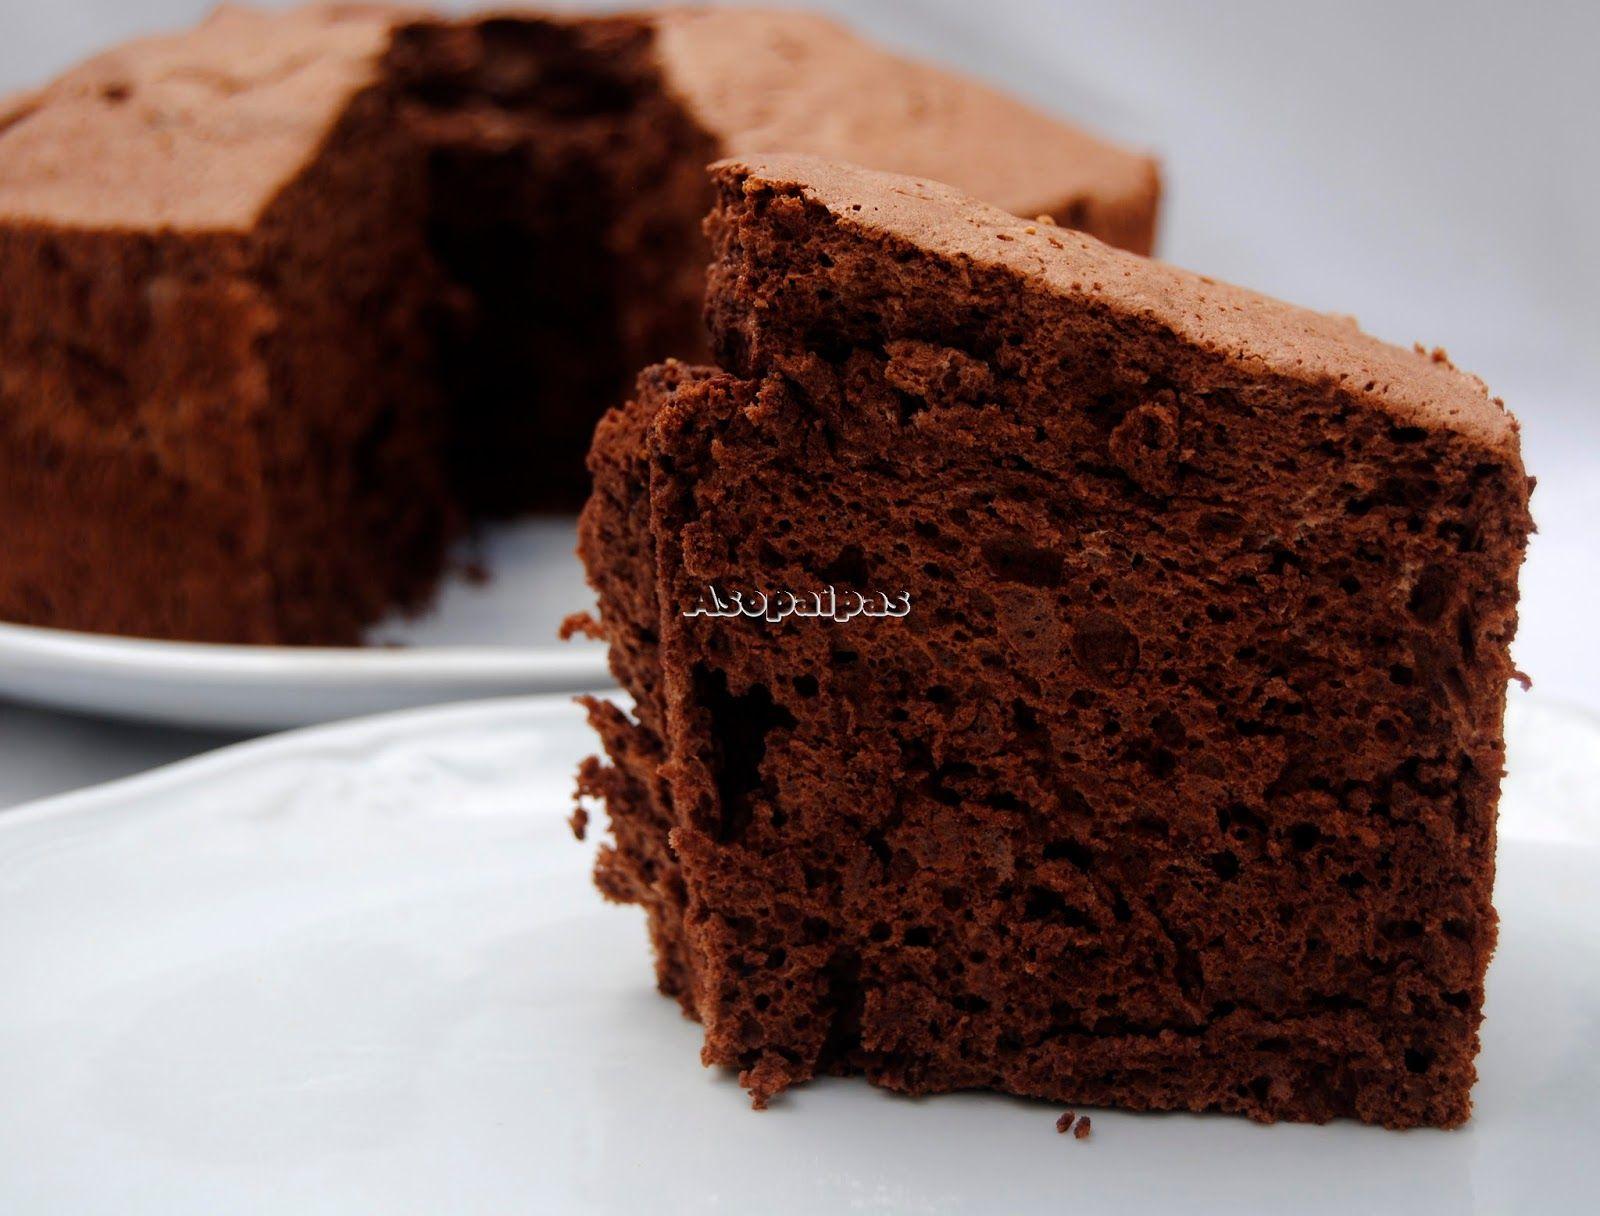 BIZCOCHO DE CHOCOLATE, Angel Food. ASOPAIPAS | 35. Rep. Chocolate ...